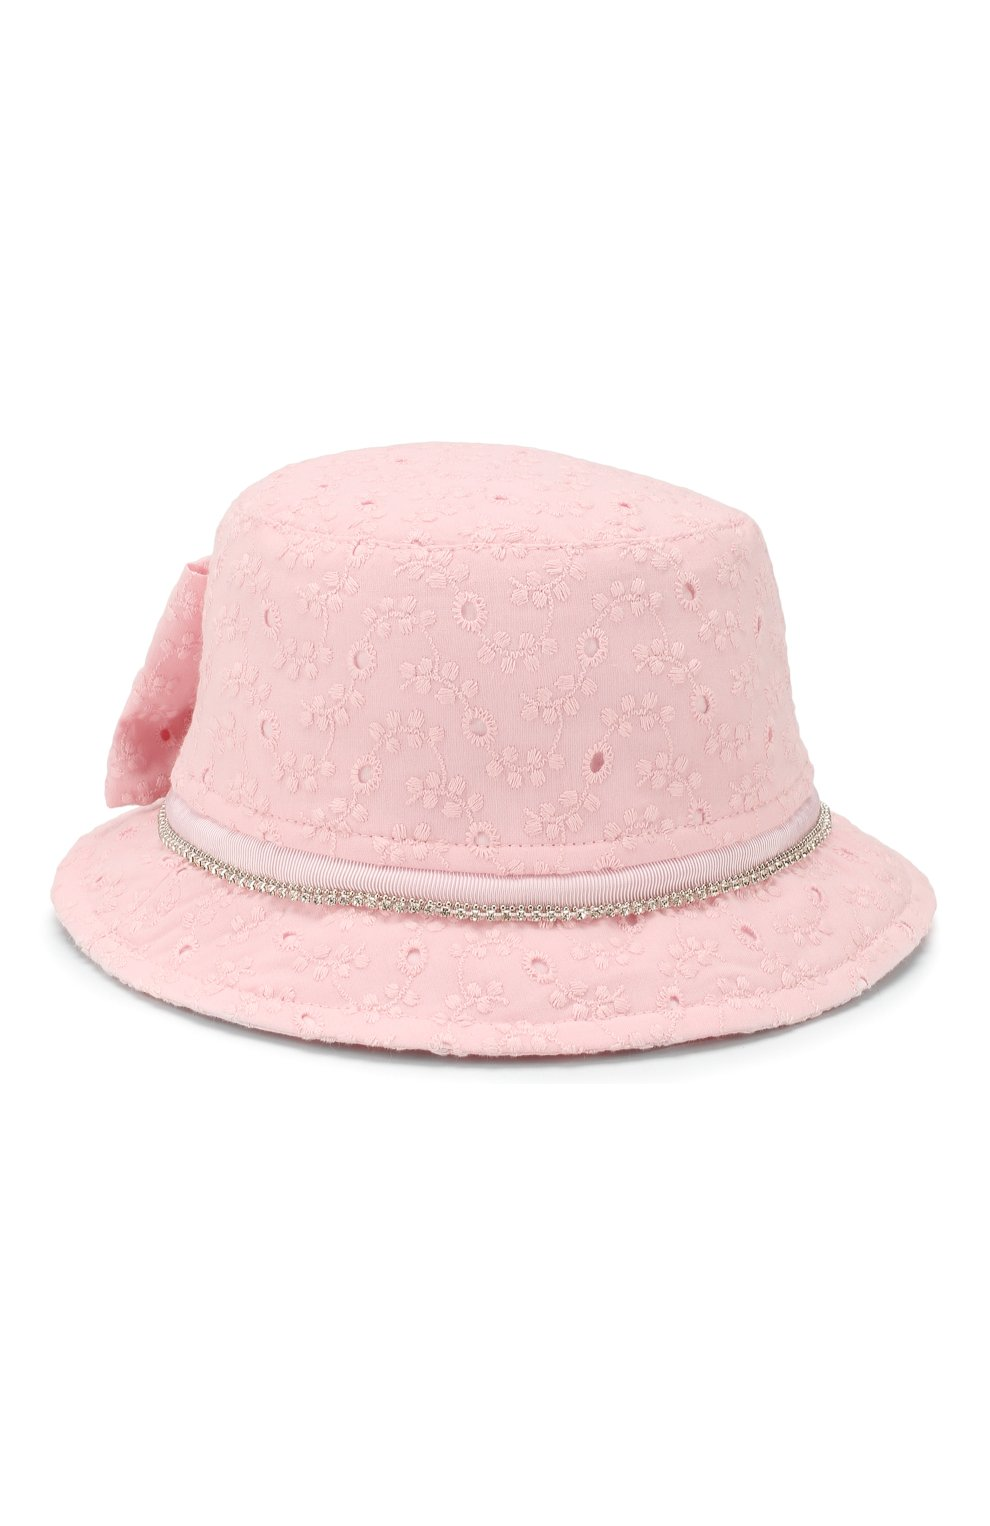 Детская панама MONNALISA розового цвета, арт. 395015 | Фото 1